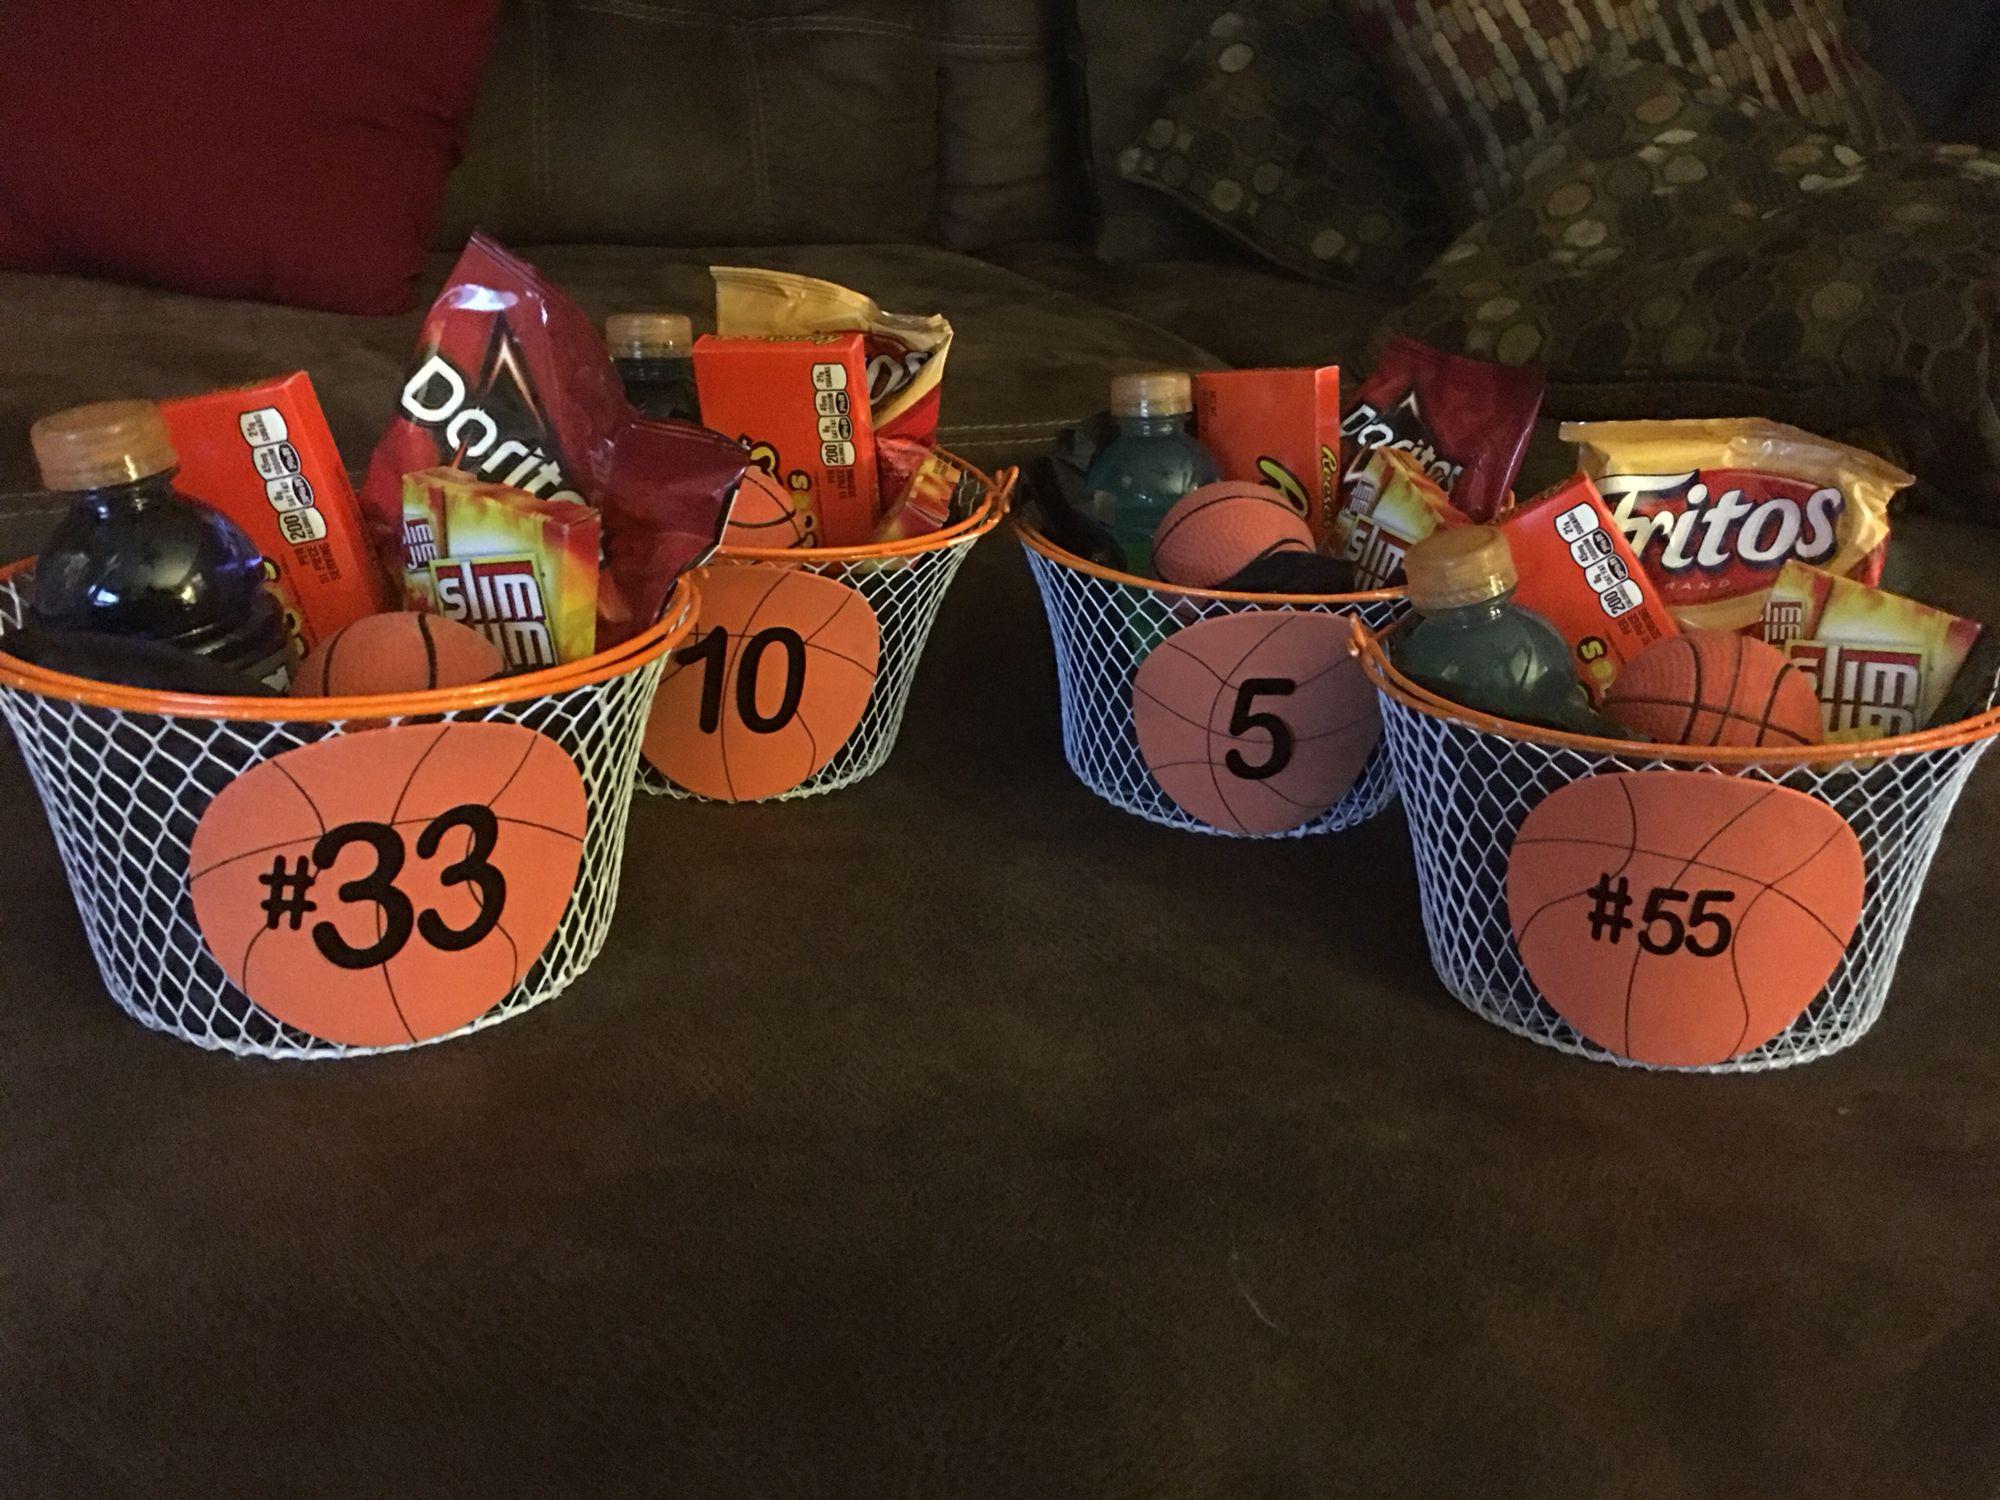 8th Grade Basketball Gift Baskets Basketball Gifts Basketball Birthday Parties Basketball Player Gifts